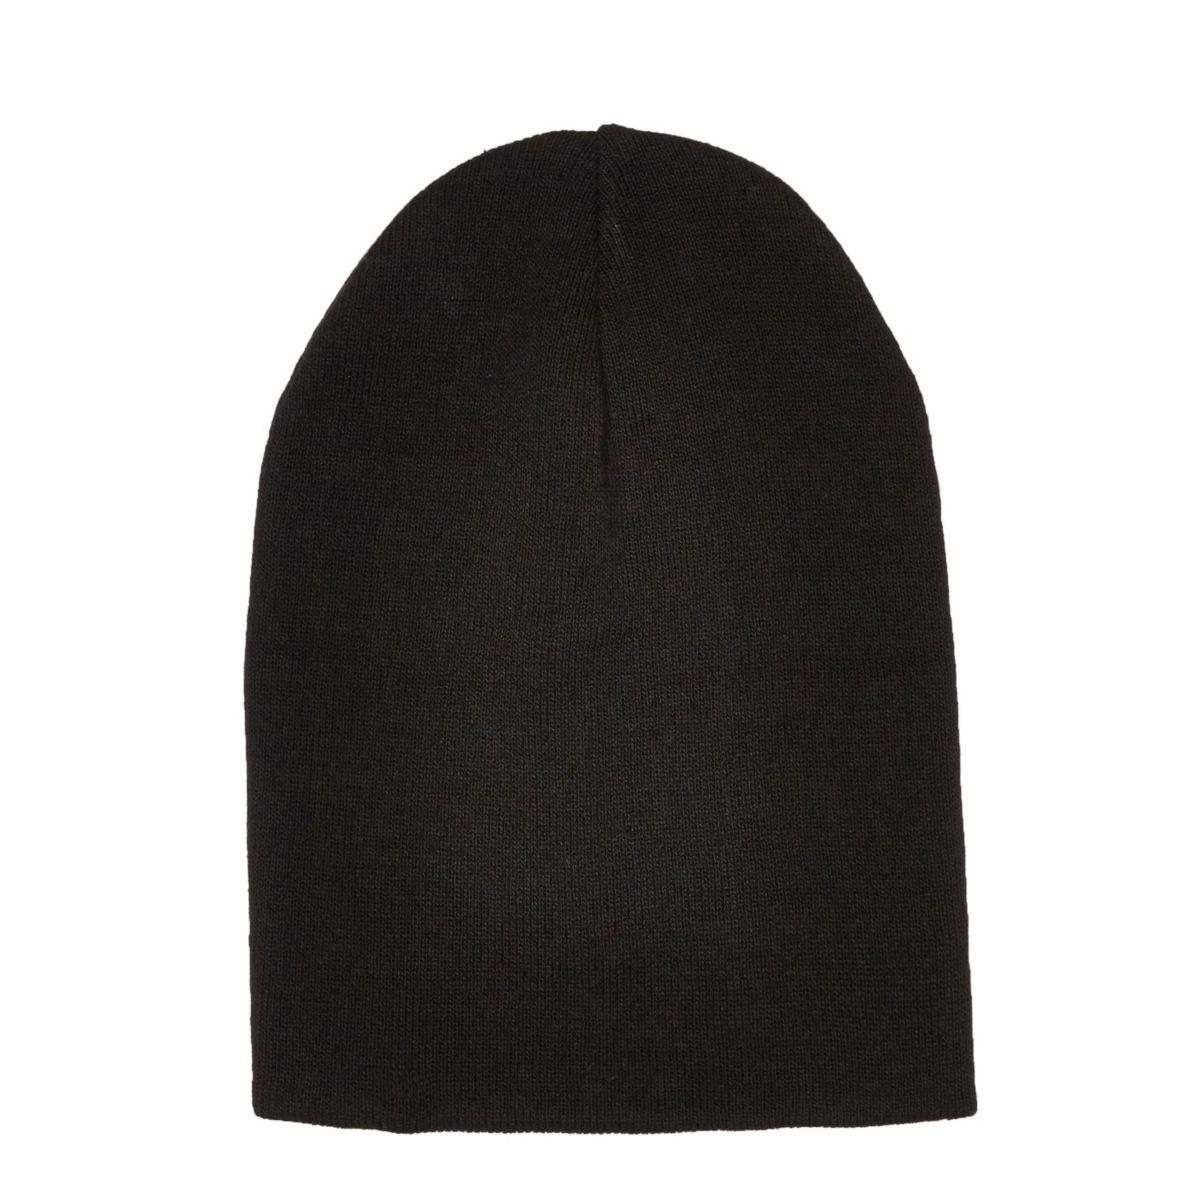 Black slouchy knit beanie hat